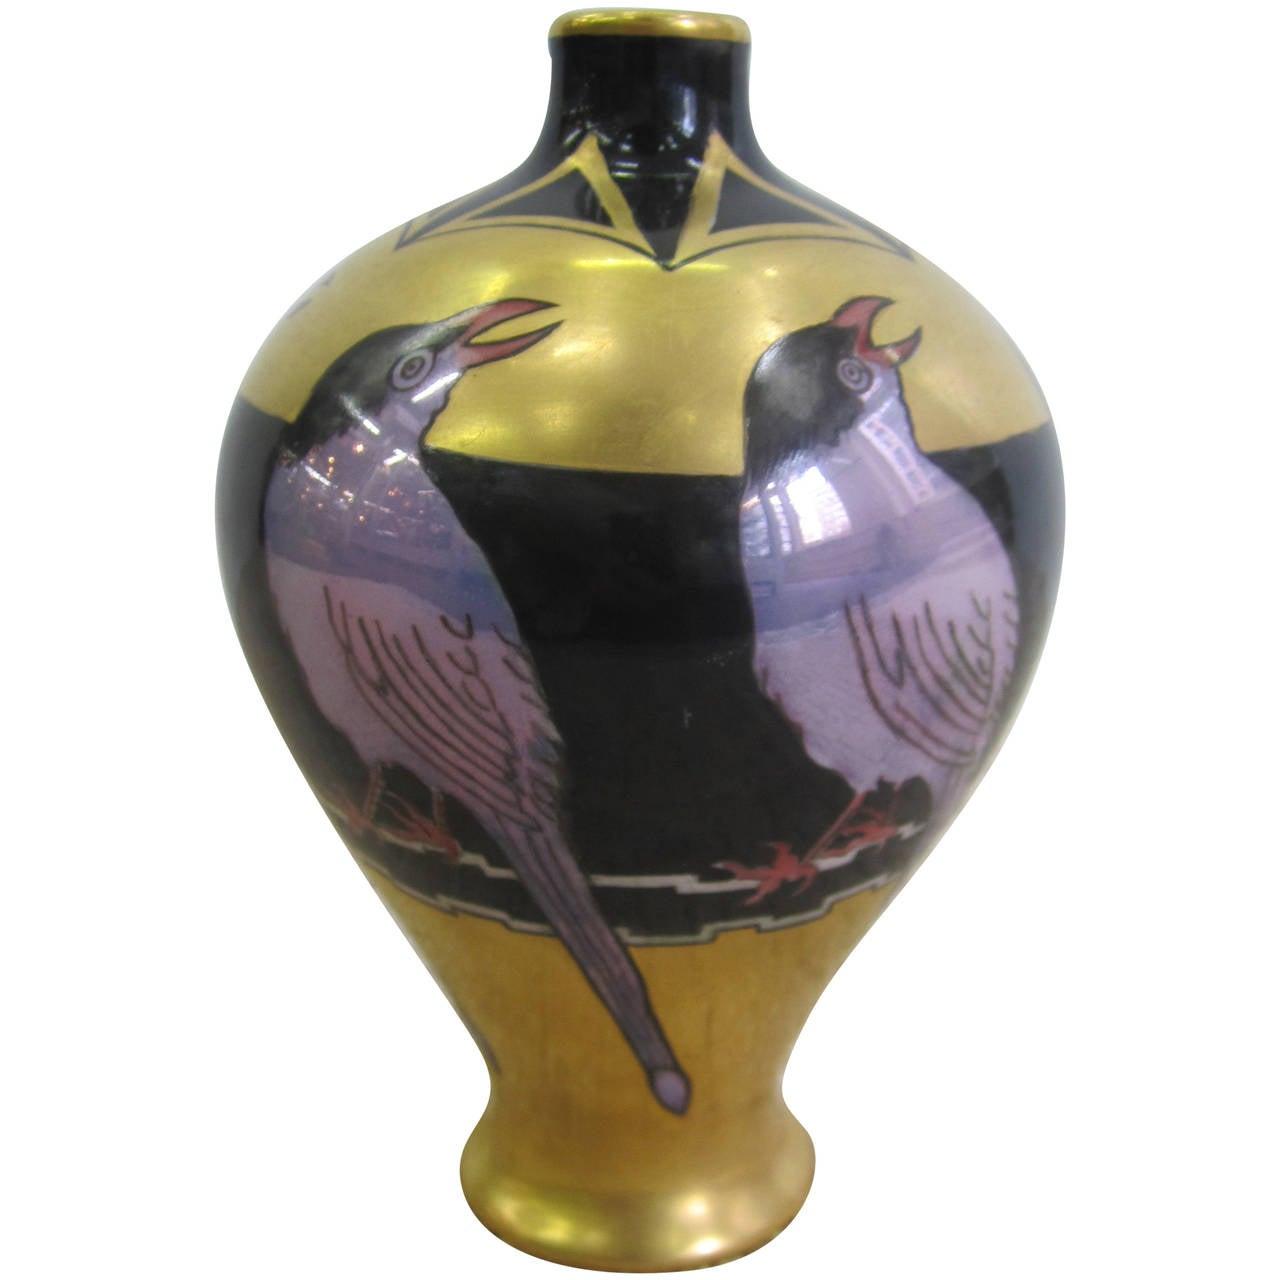 French art deco black and gold porcelain vase for sale at 1stdibs french art deco black and gold porcelain vase for sale reviewsmspy